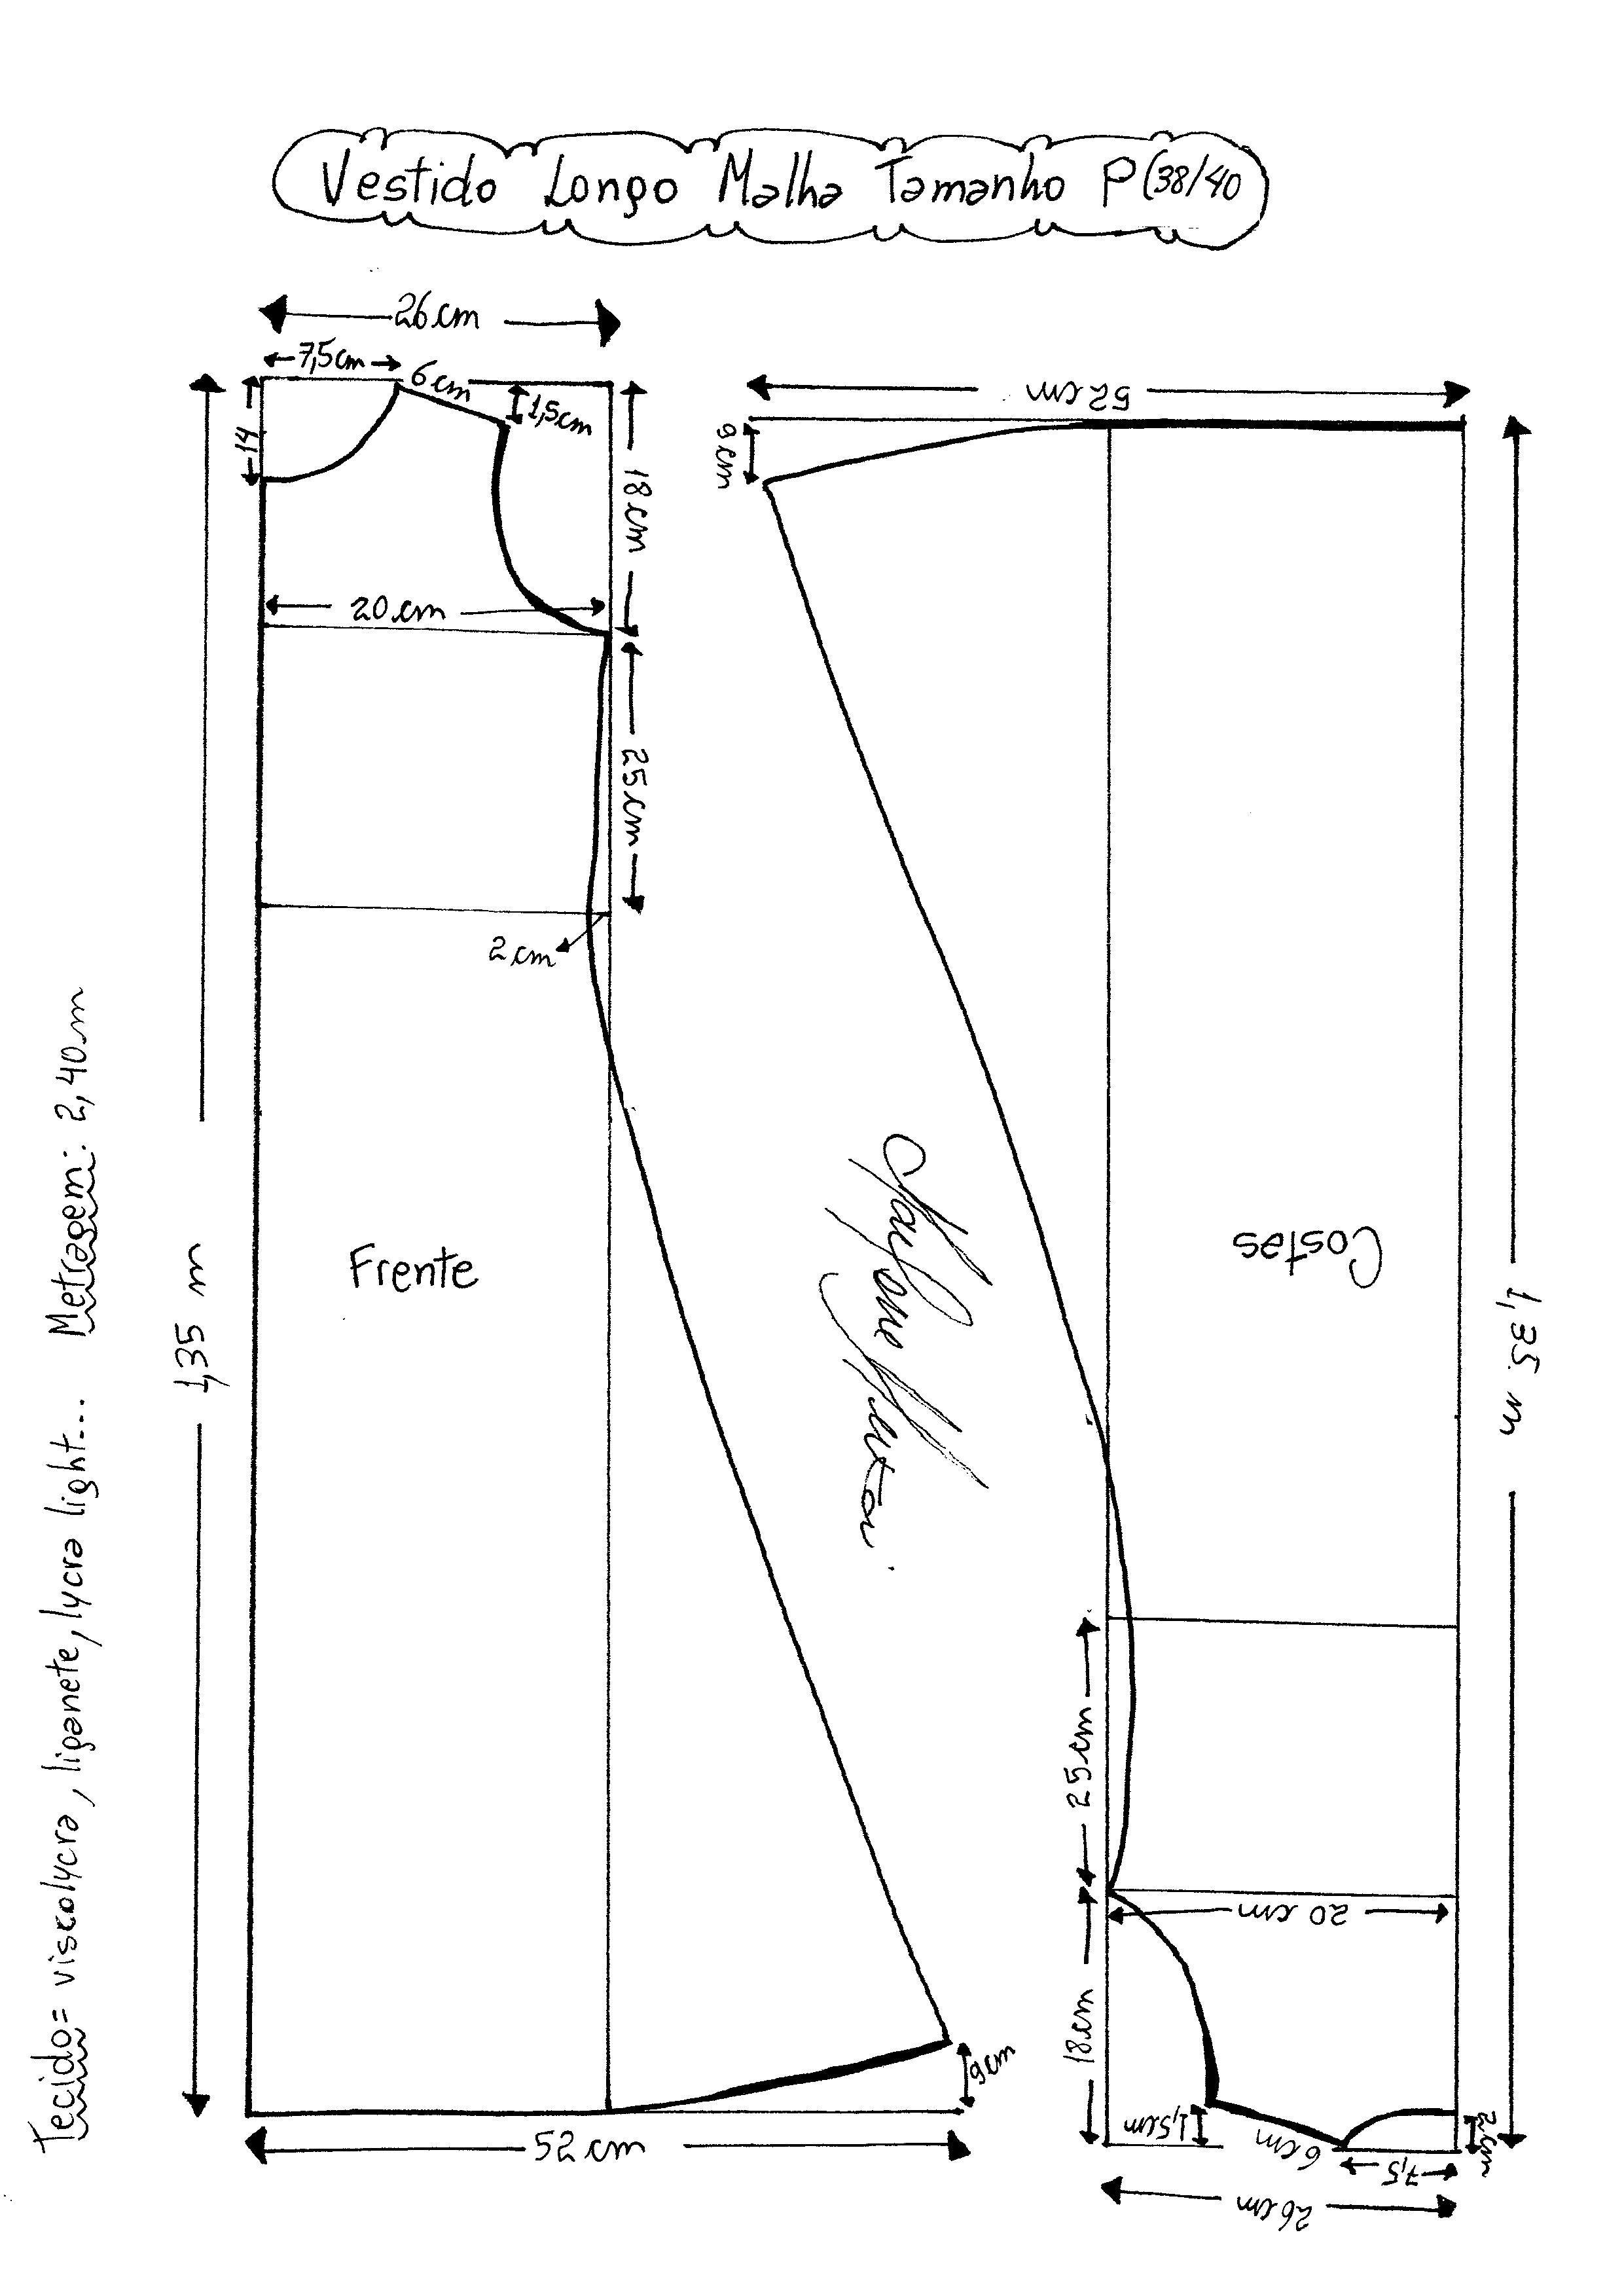 Vestido longo de Malha Regata | PATRON | Pinterest | Patterns ...